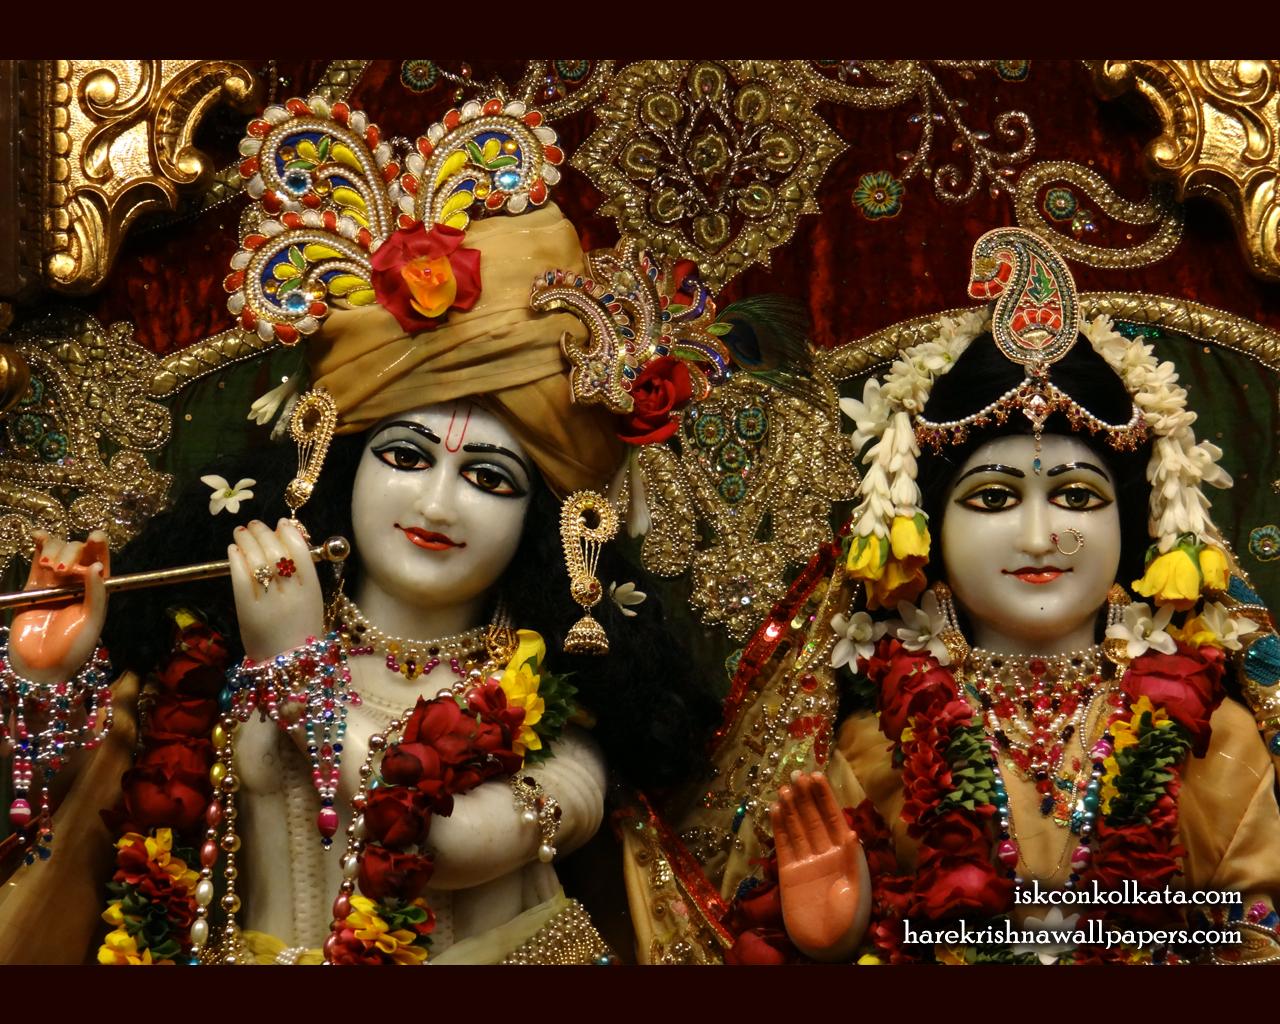 Sri Sri Radha Govinda Close up Wallpaper (009) Size 1280x1024 Download